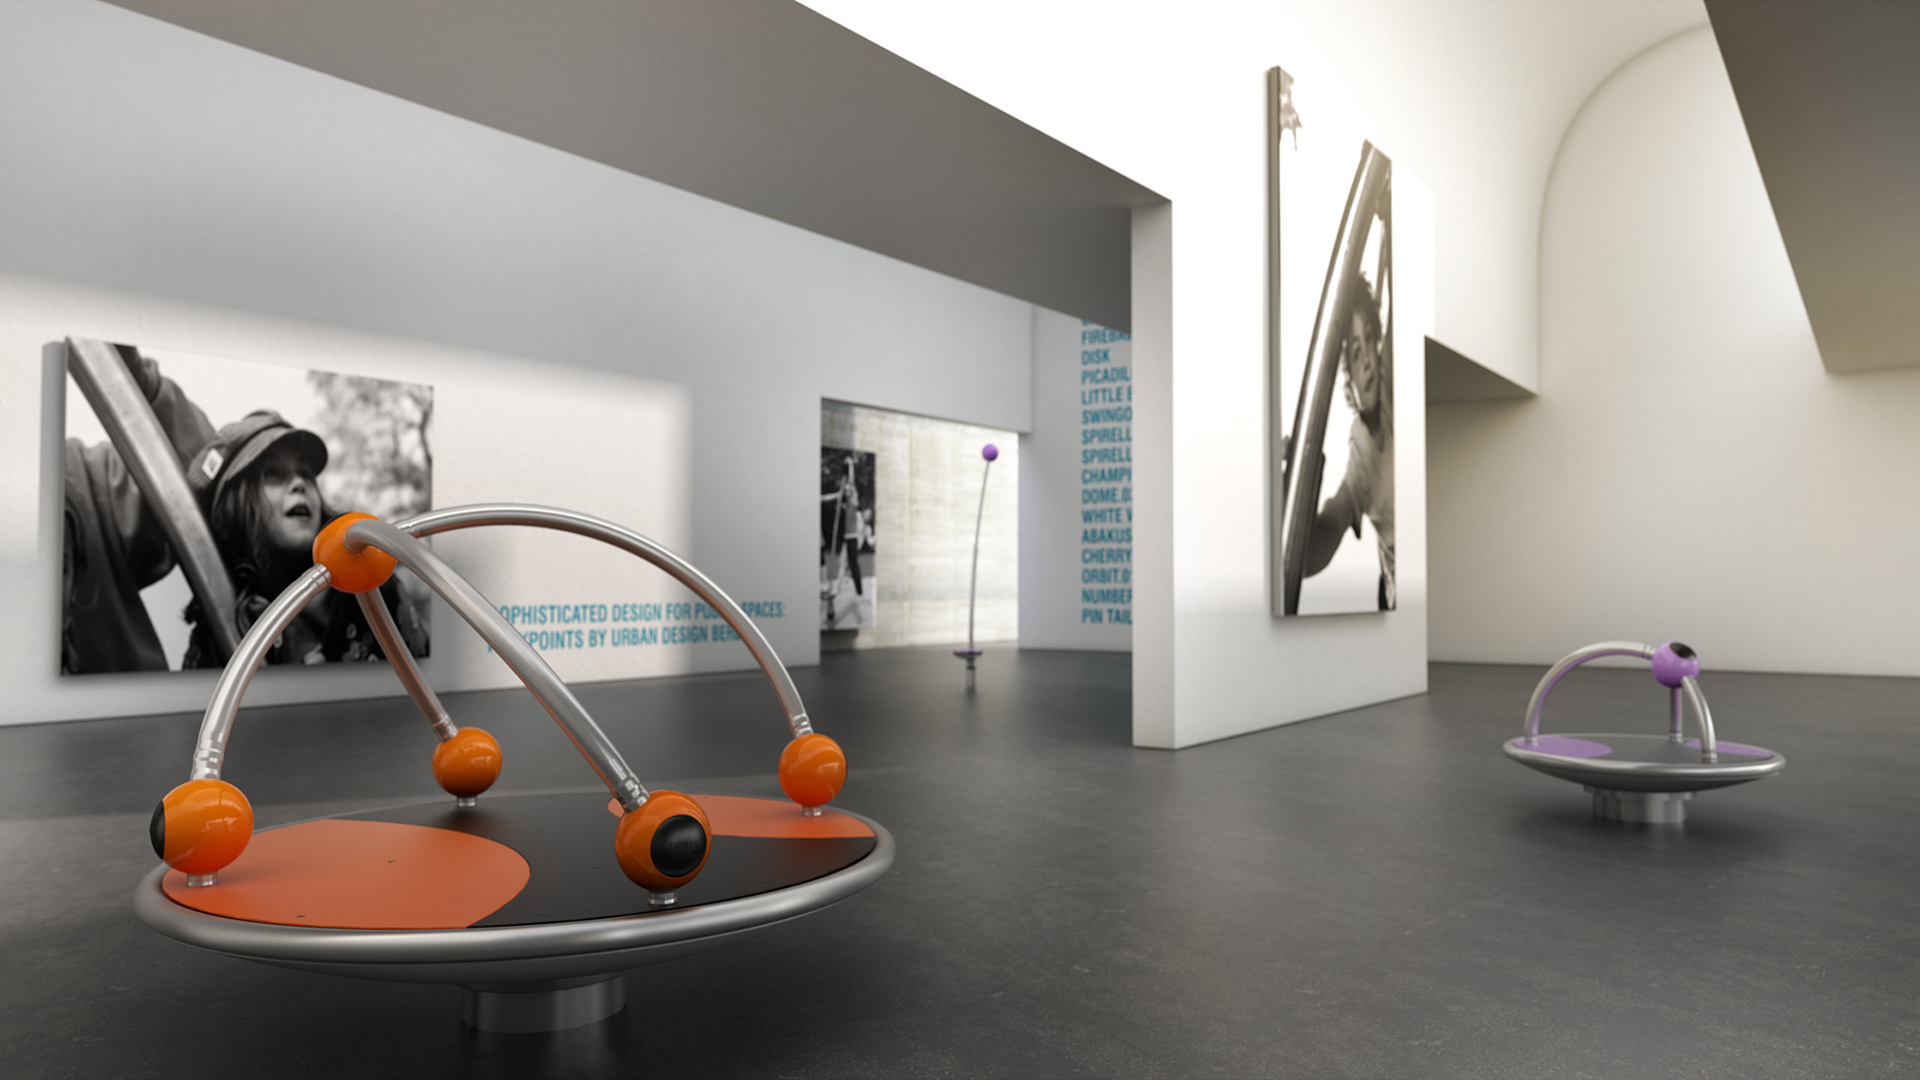 Urbandesign berlin productvisual by xoio xoio for Product design berlin